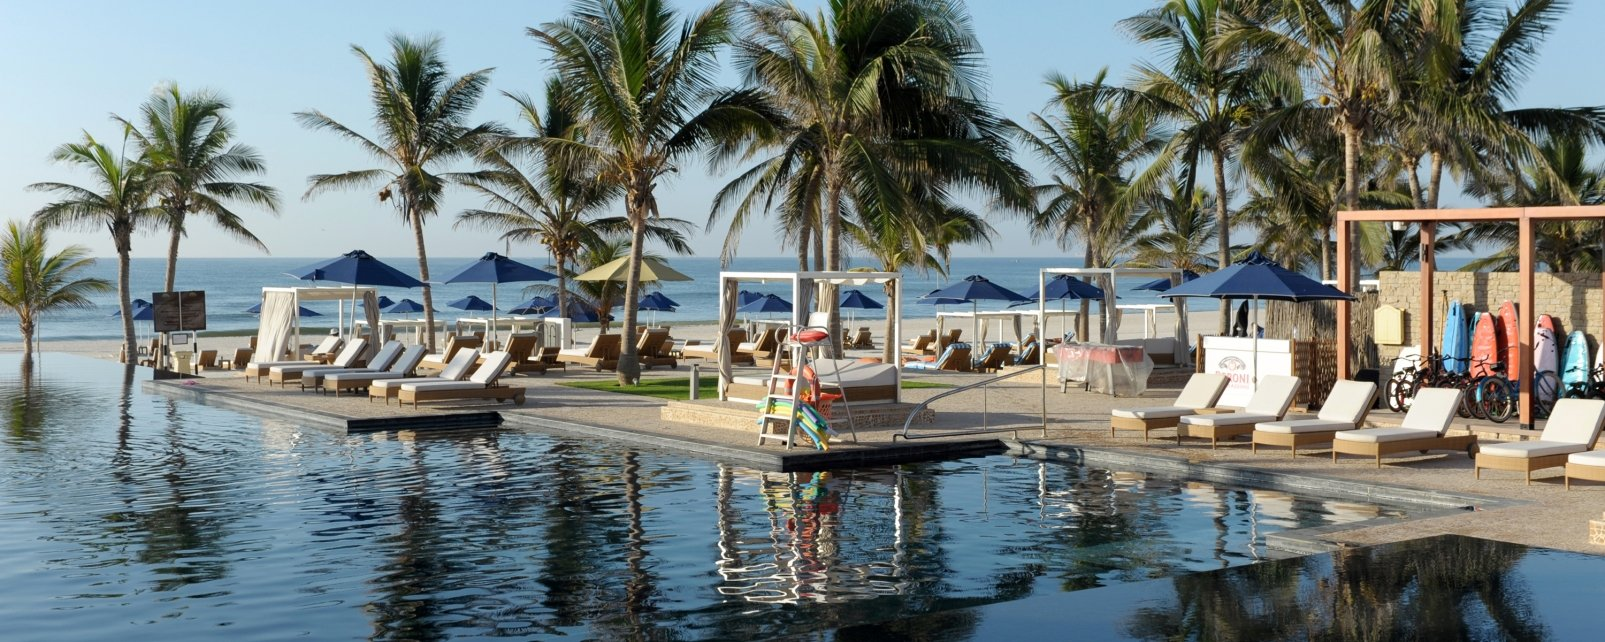 Hôtel Al Baleed Resort Salalah by Anantara